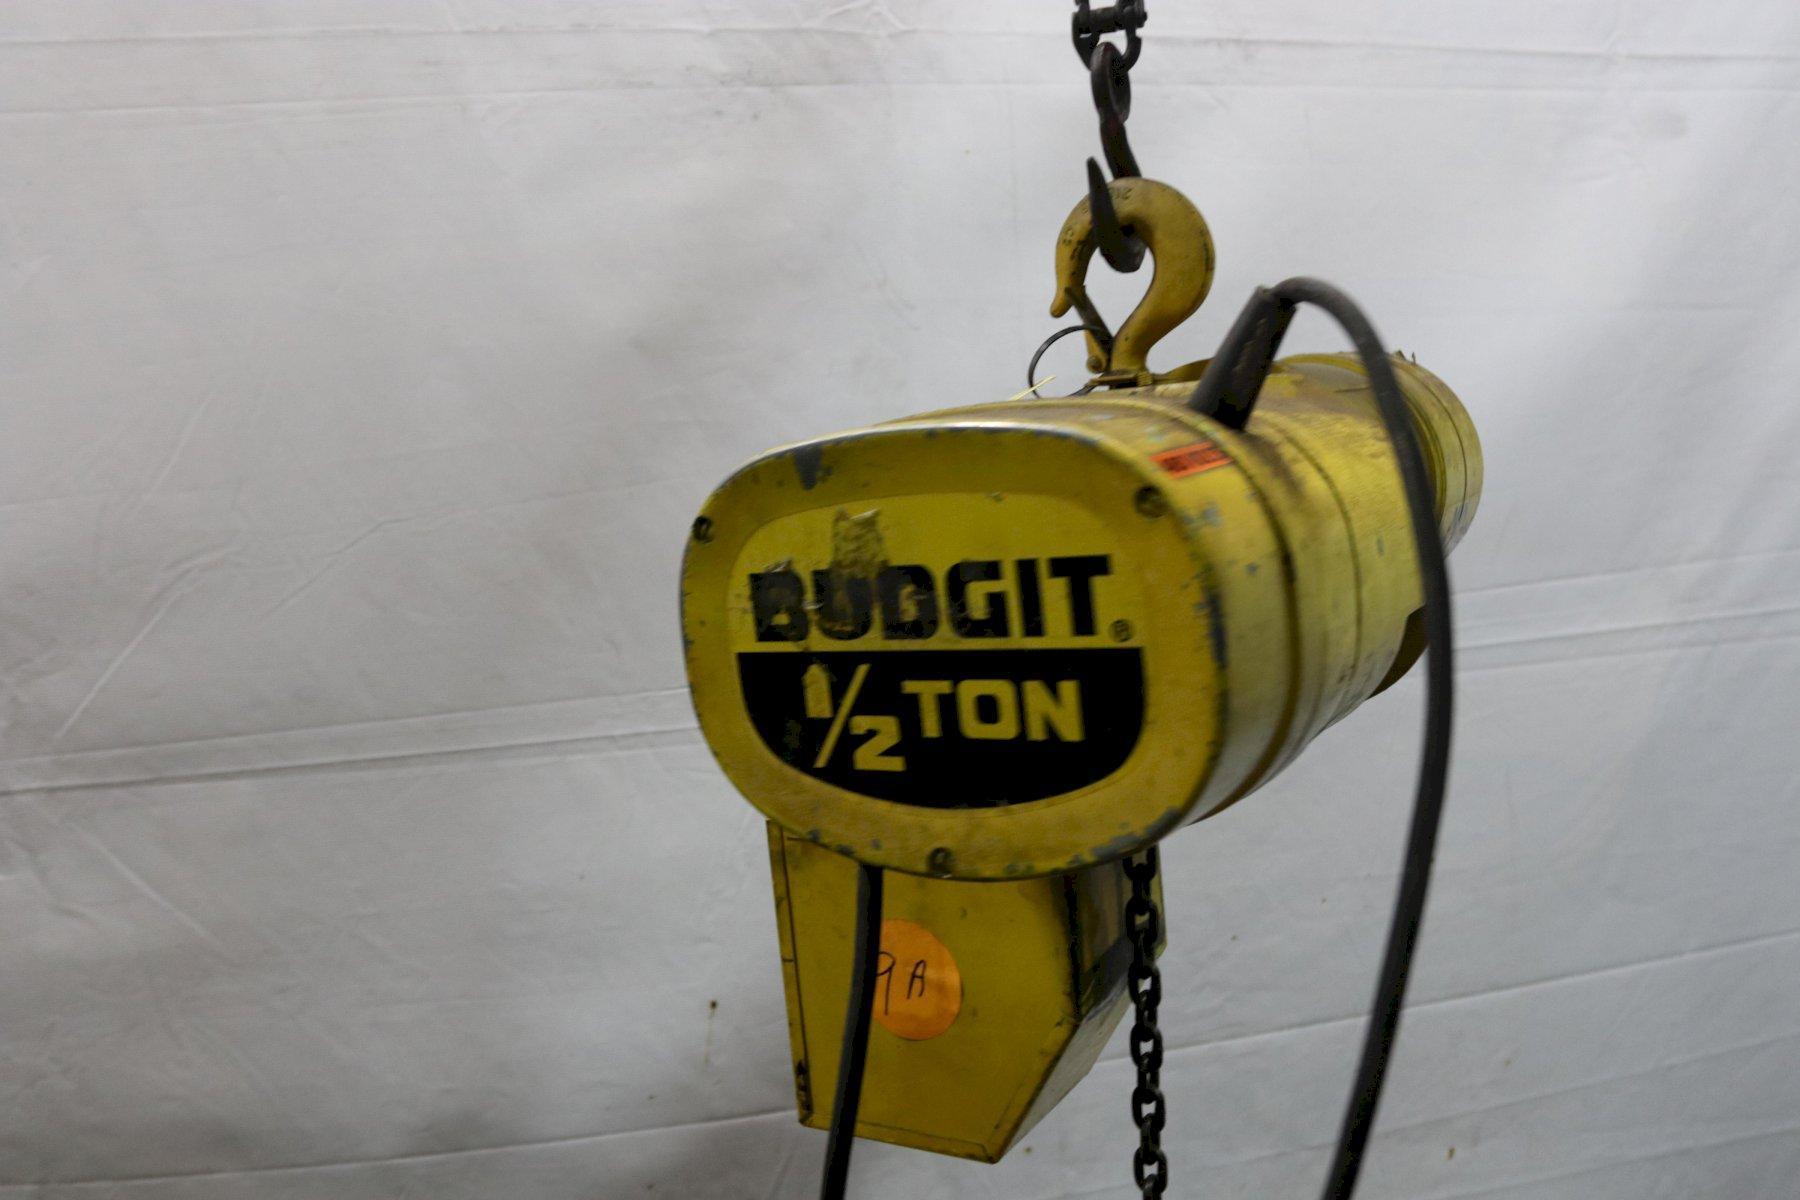 1/2 TON BUDGIT POWER CHAIN HOIST : STOCK #11991